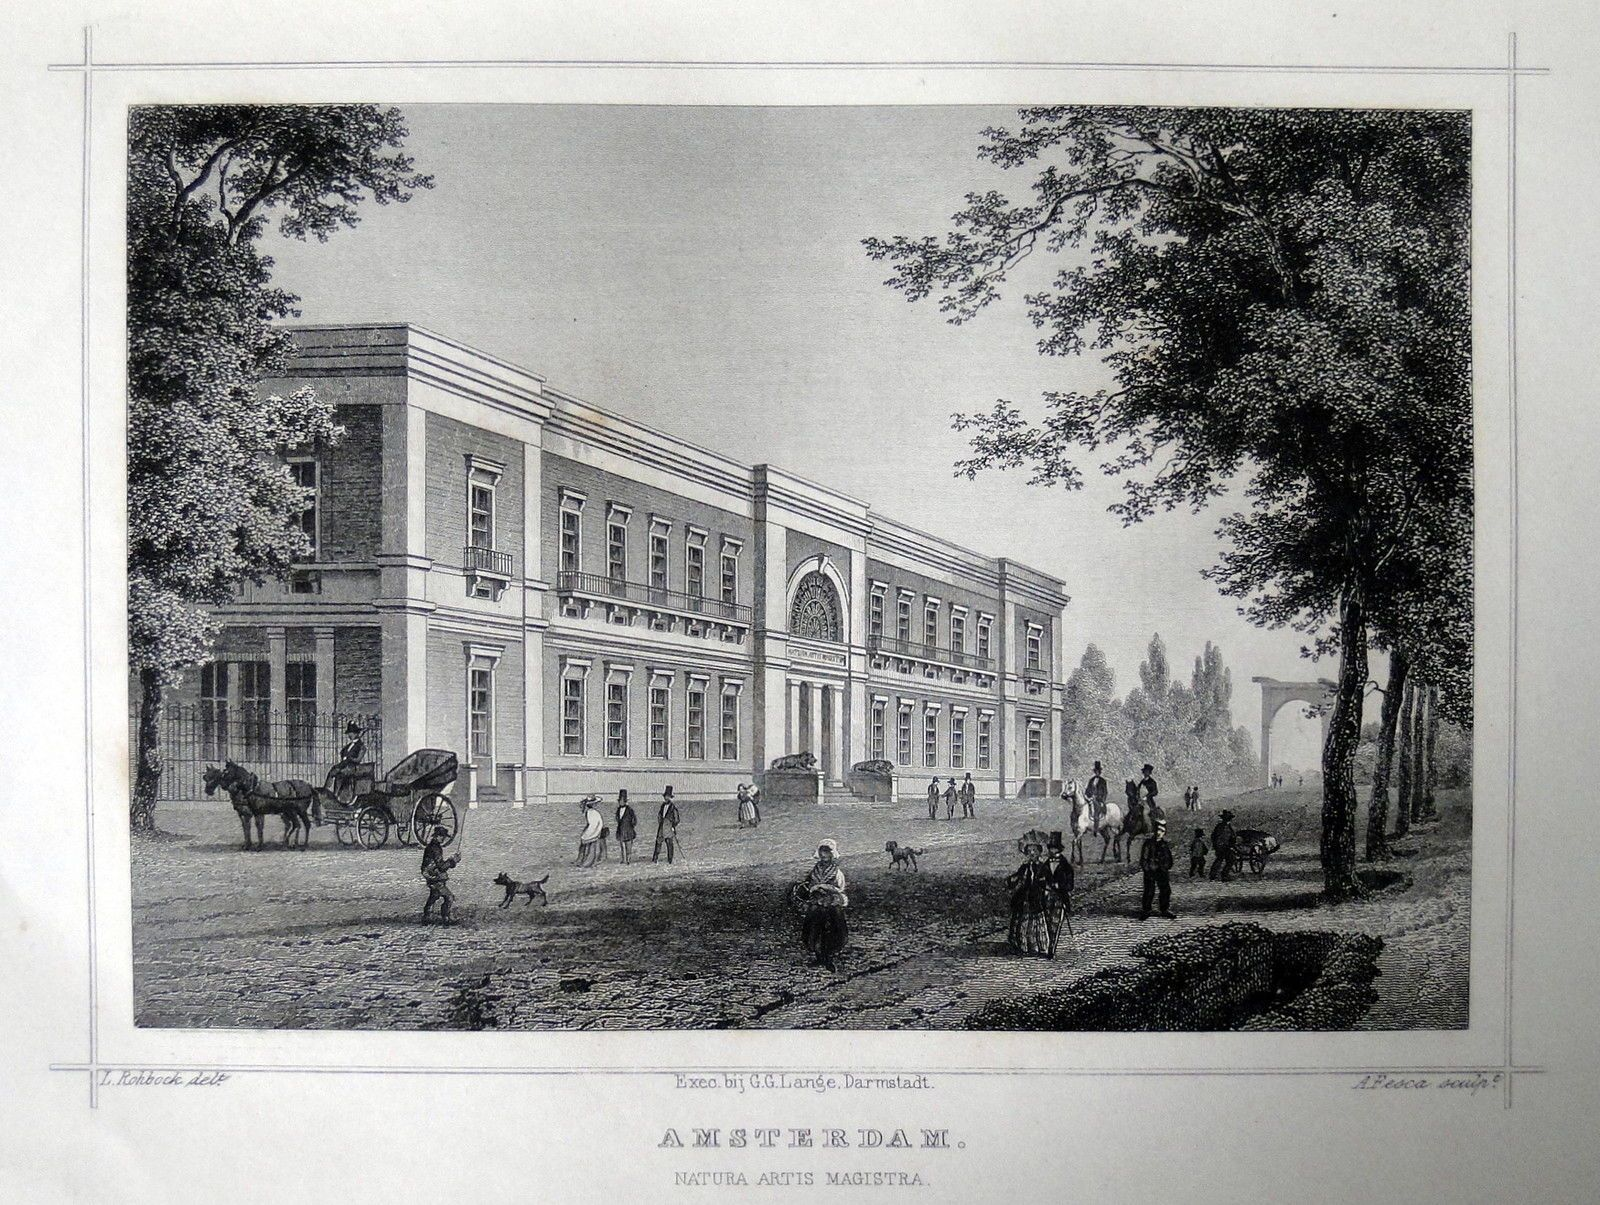 Amsterdam-Artis |Herkomst : J.L. Terwen - Het Koningrijk der Nederlanden, afm. 14 x 20 cm Staalgravure 1860